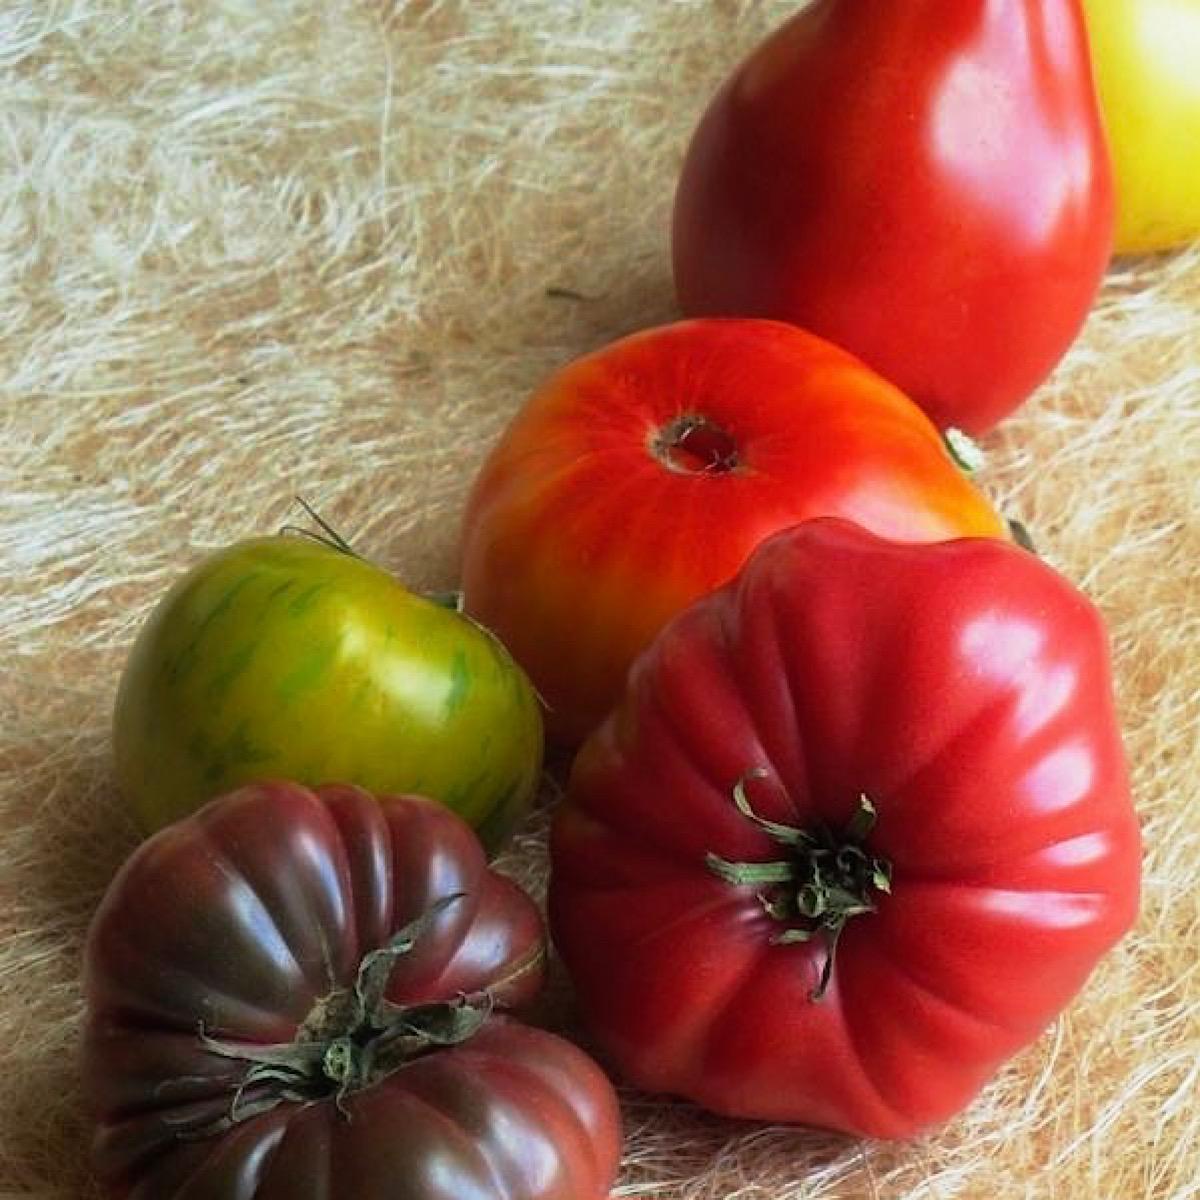 Best heirloom tomato varieties in 2020